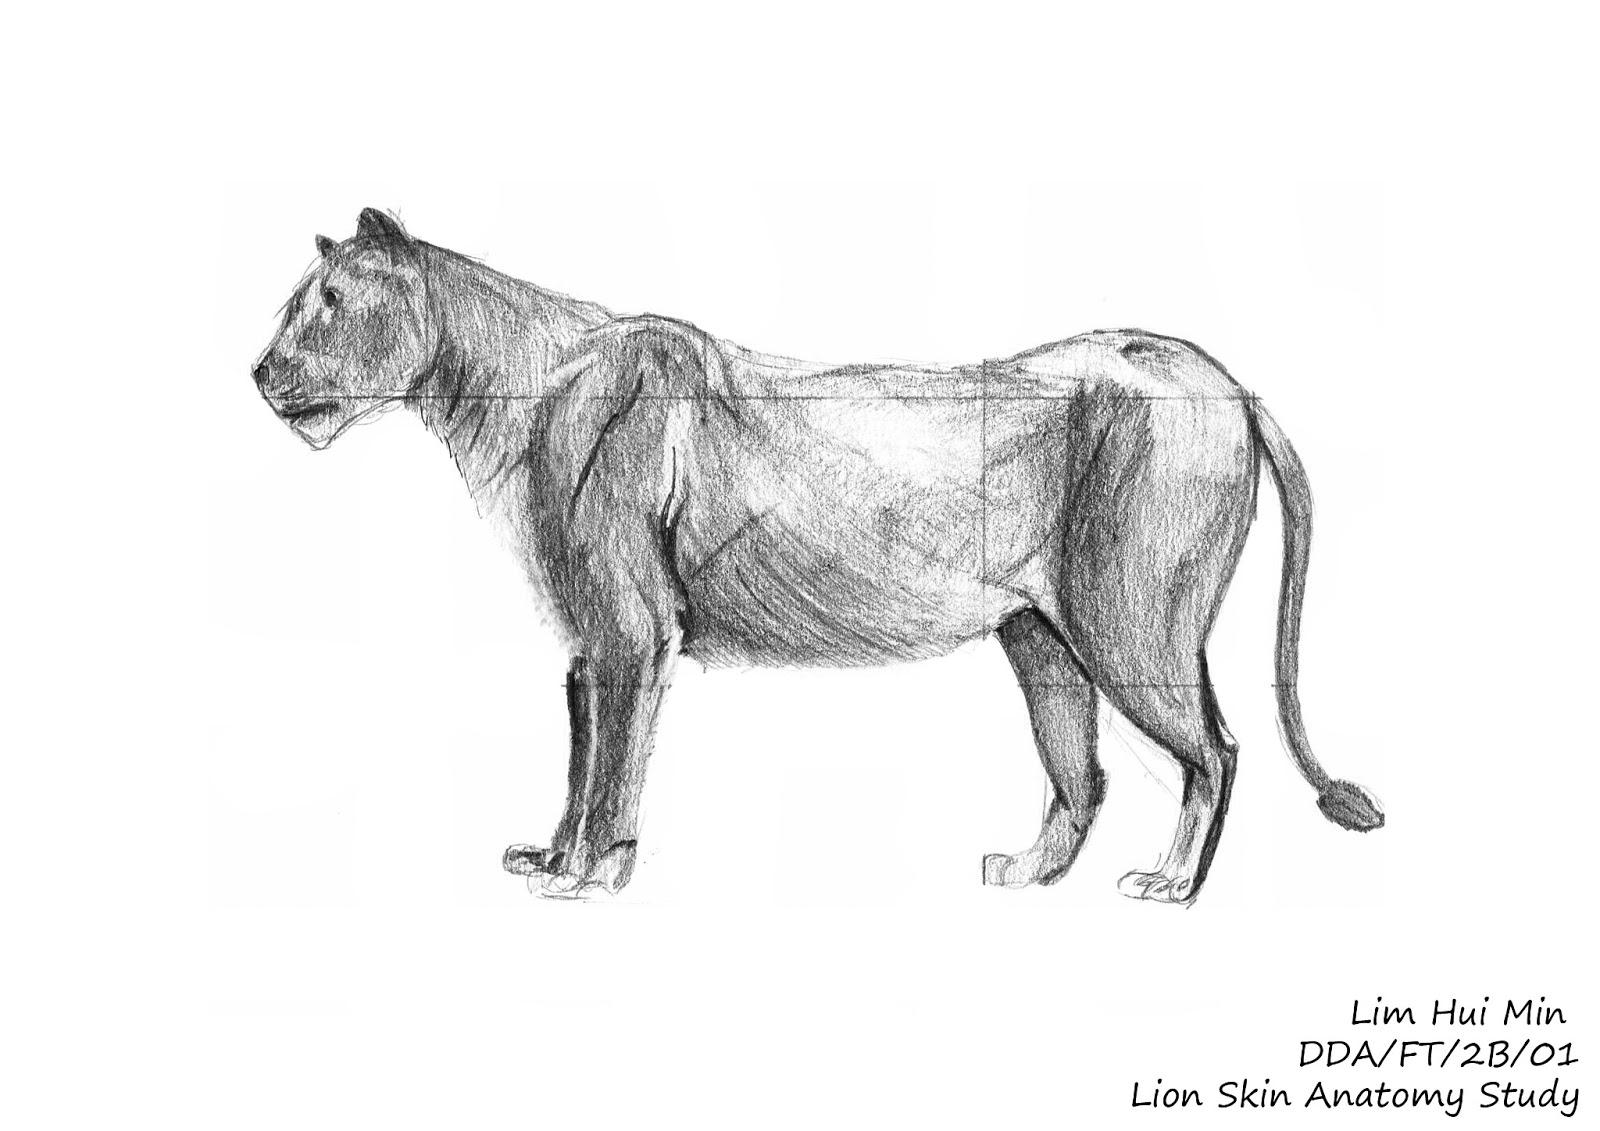 Lim Hui Min Portfolio: Animal Anatomy: Cat